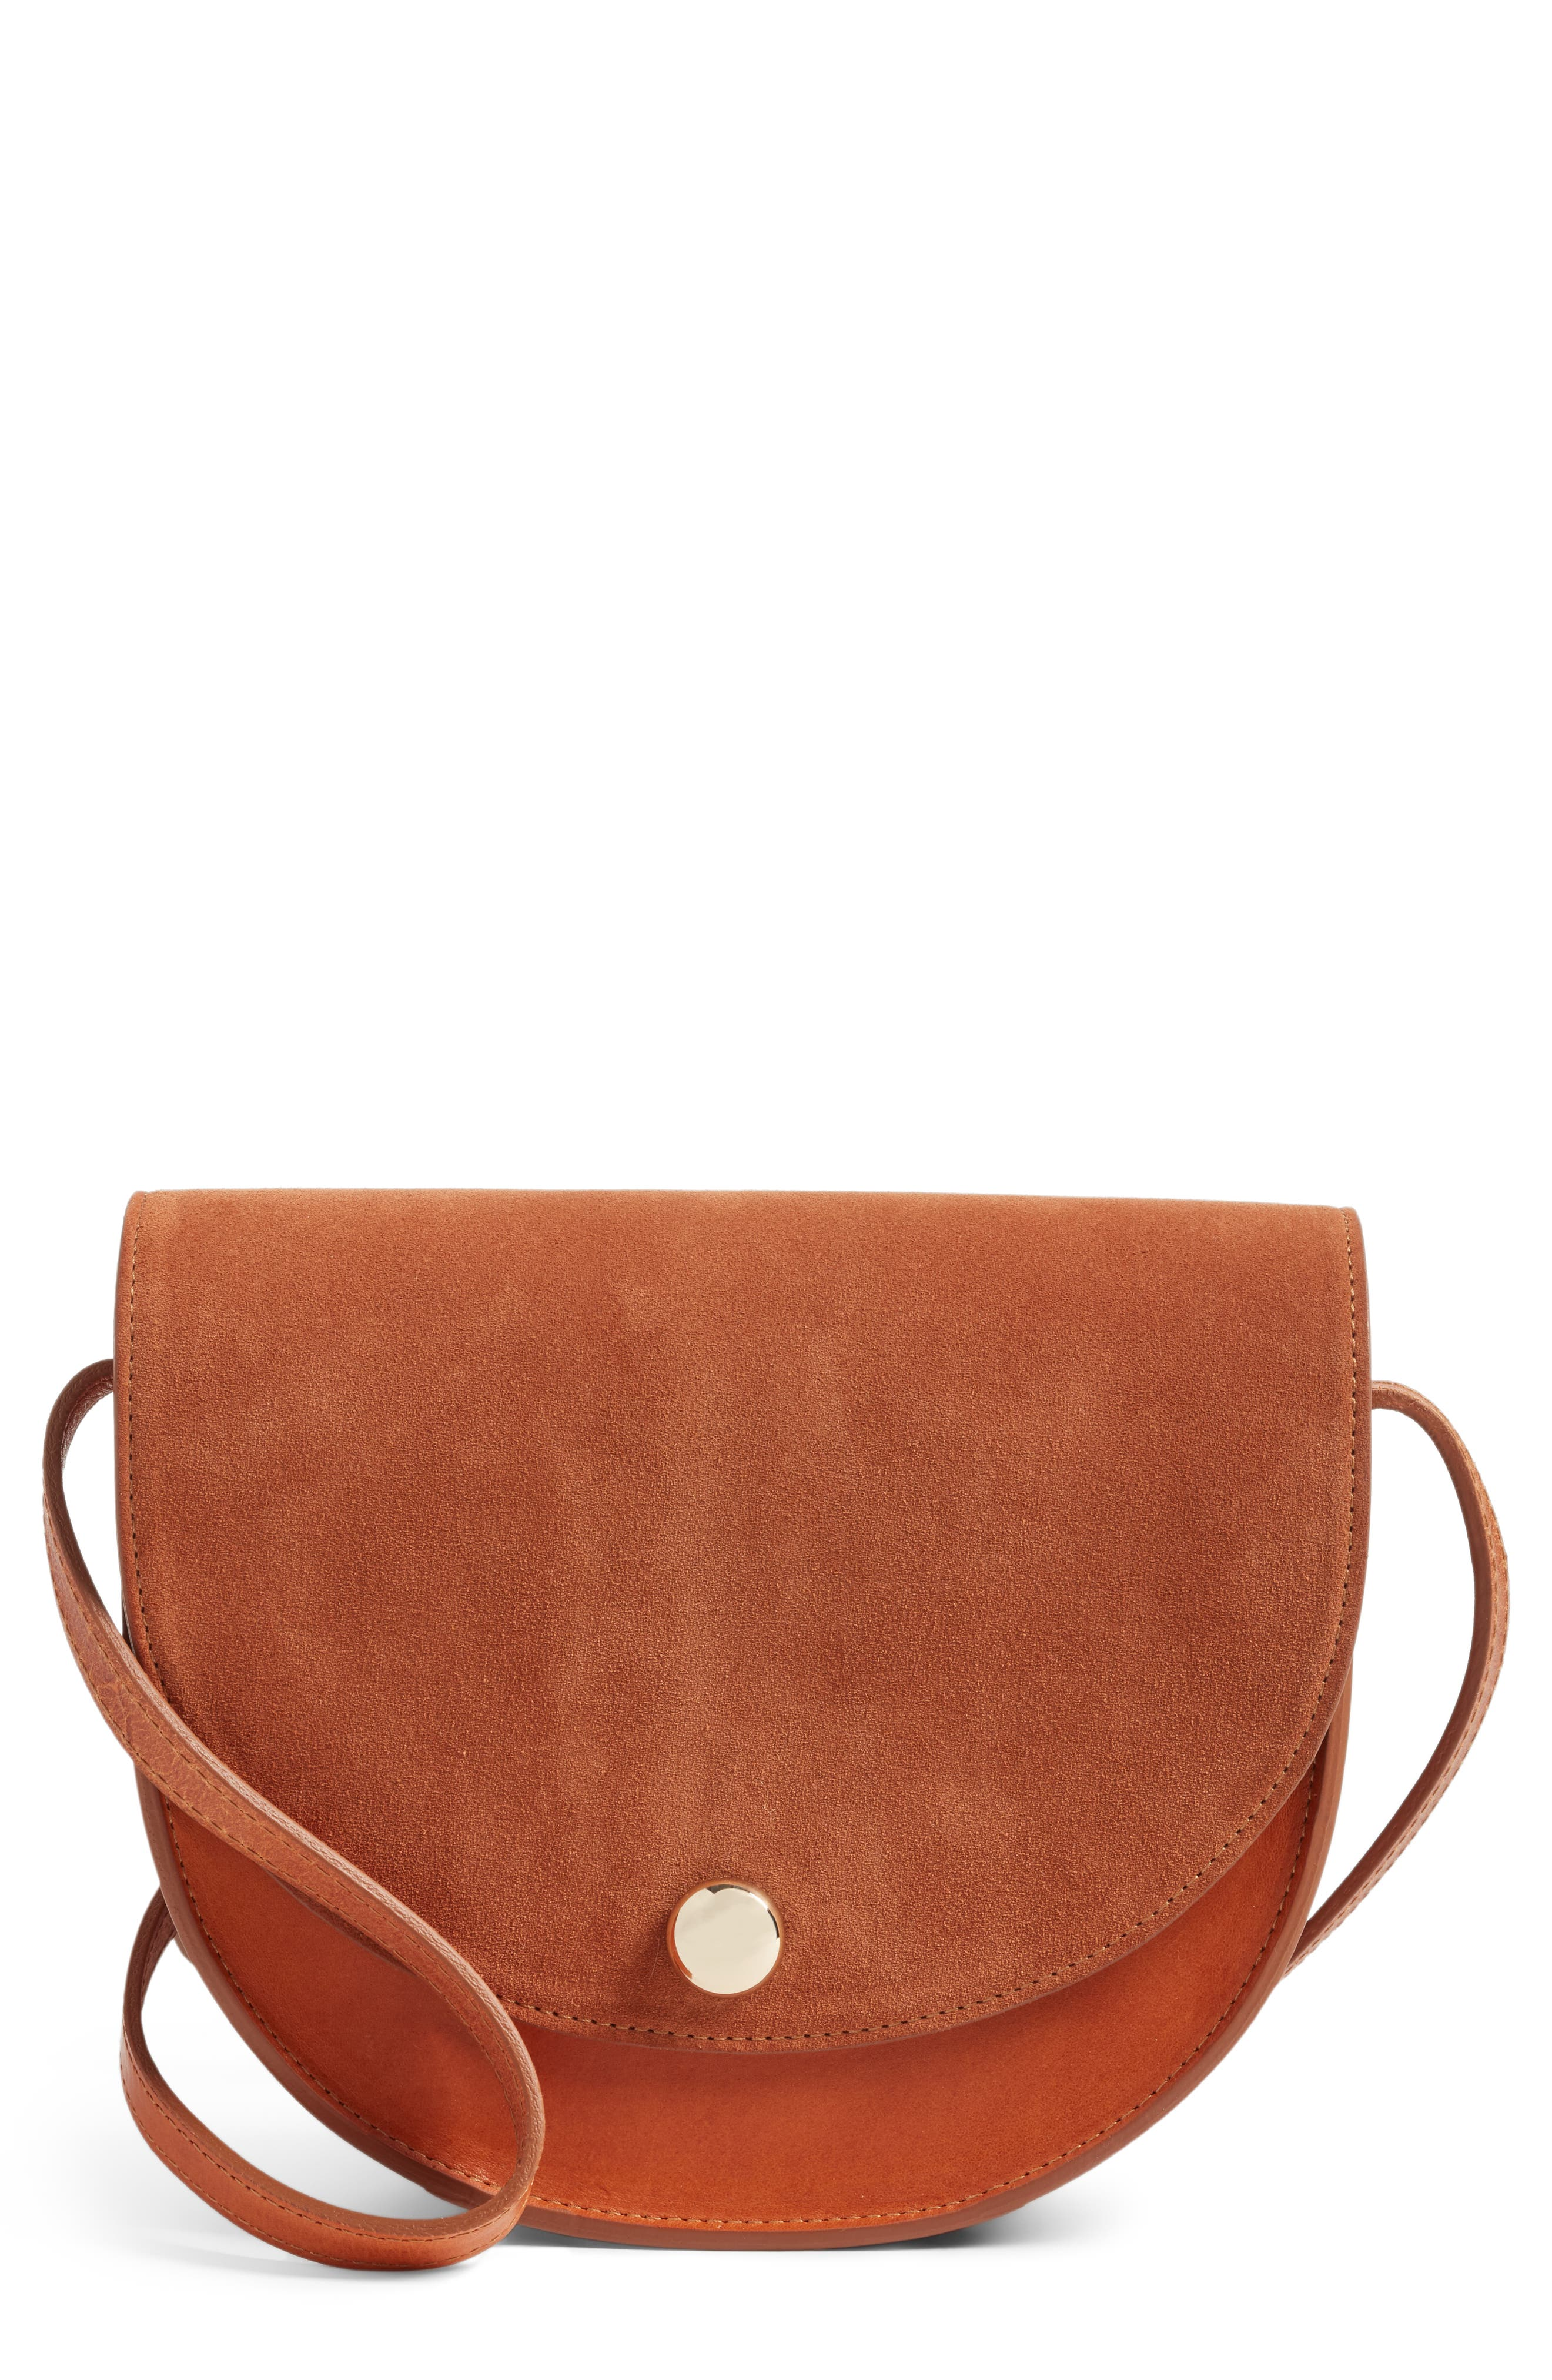 Ernest Crossbody Bag,                         Main,                         color, Bi Fabric Camel